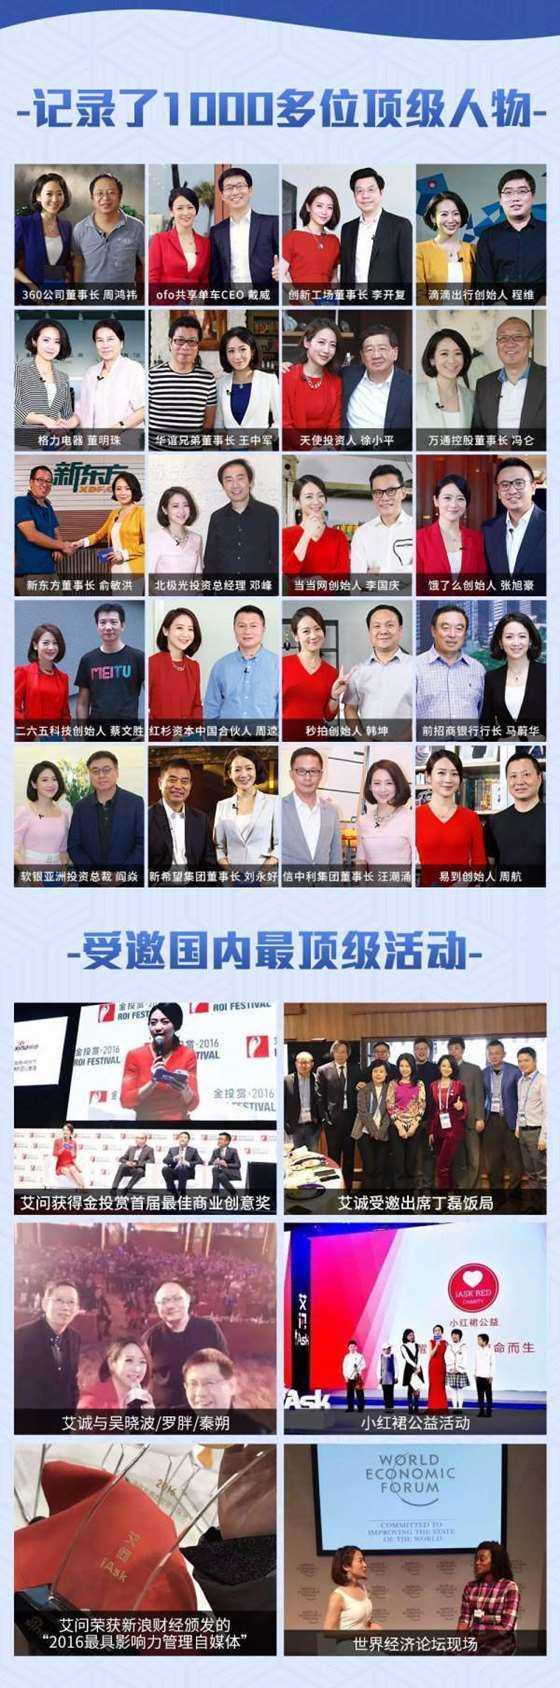 http://www.huodongxing.com/file/20160530/5092341960349/793167923063194.jpeg